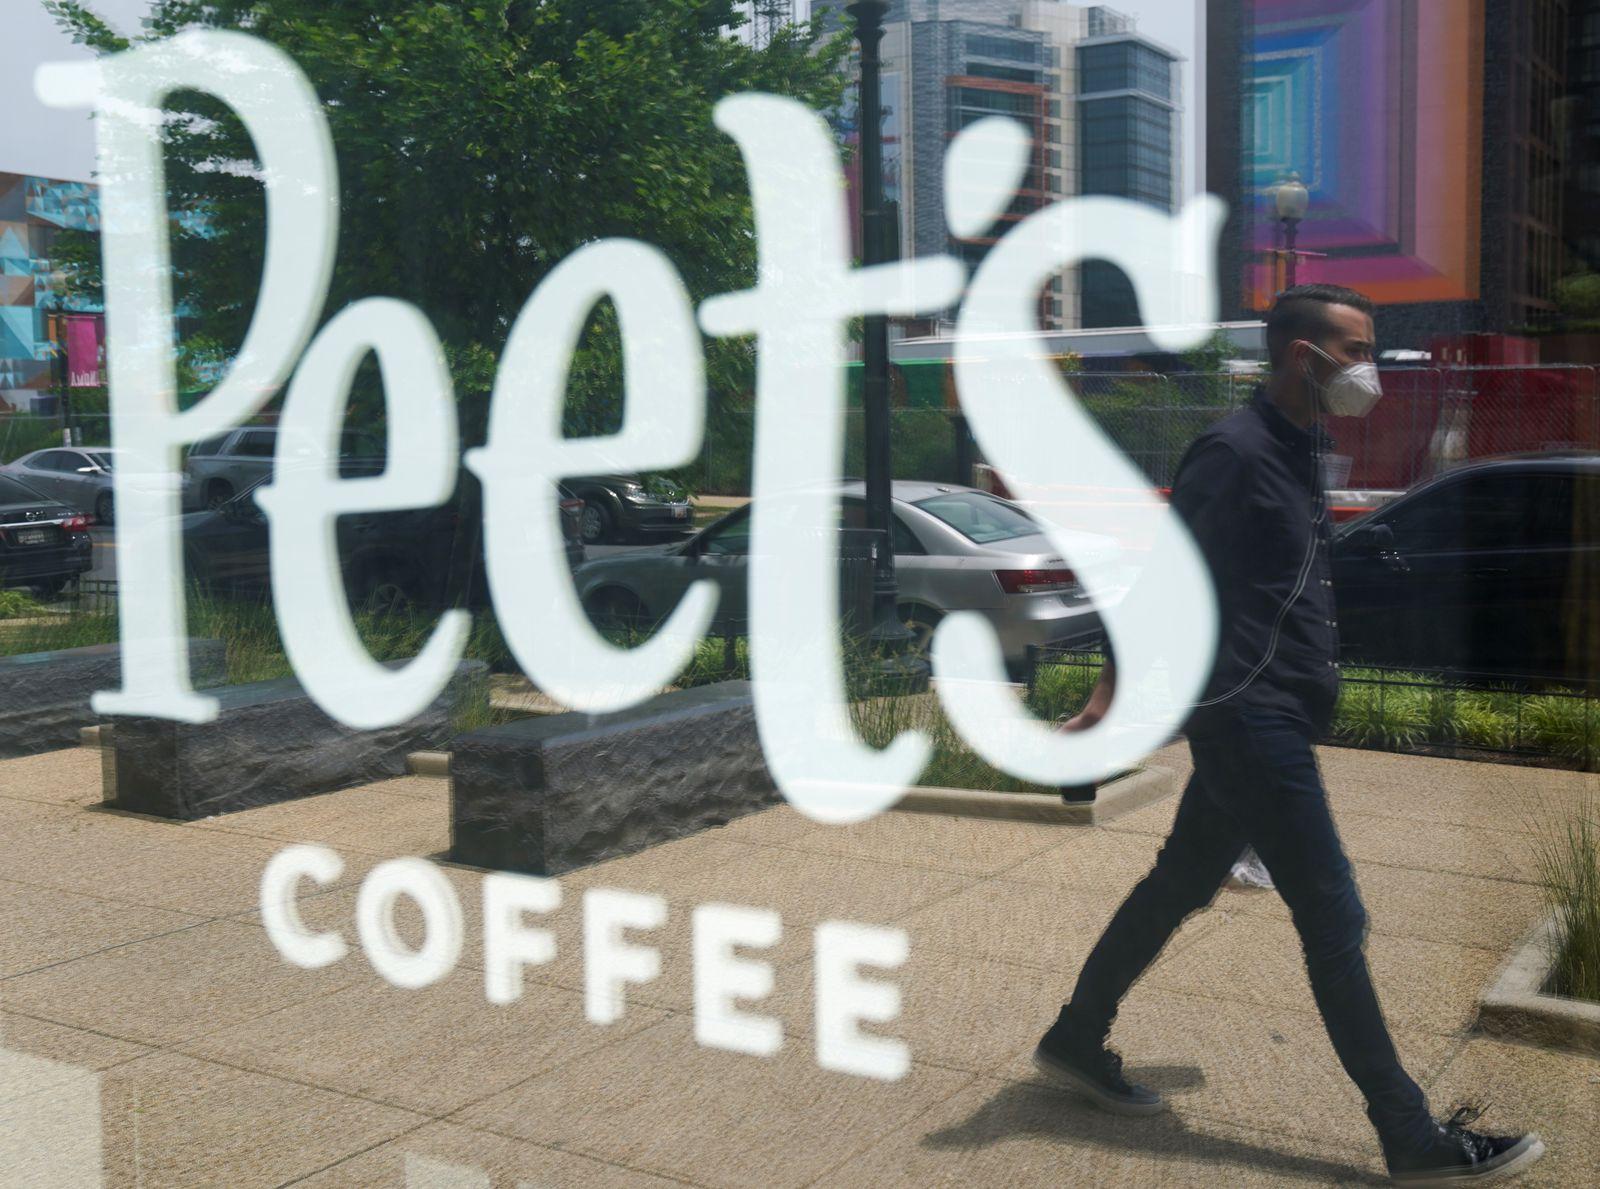 A man passes a Peet's coffee shop in Washington